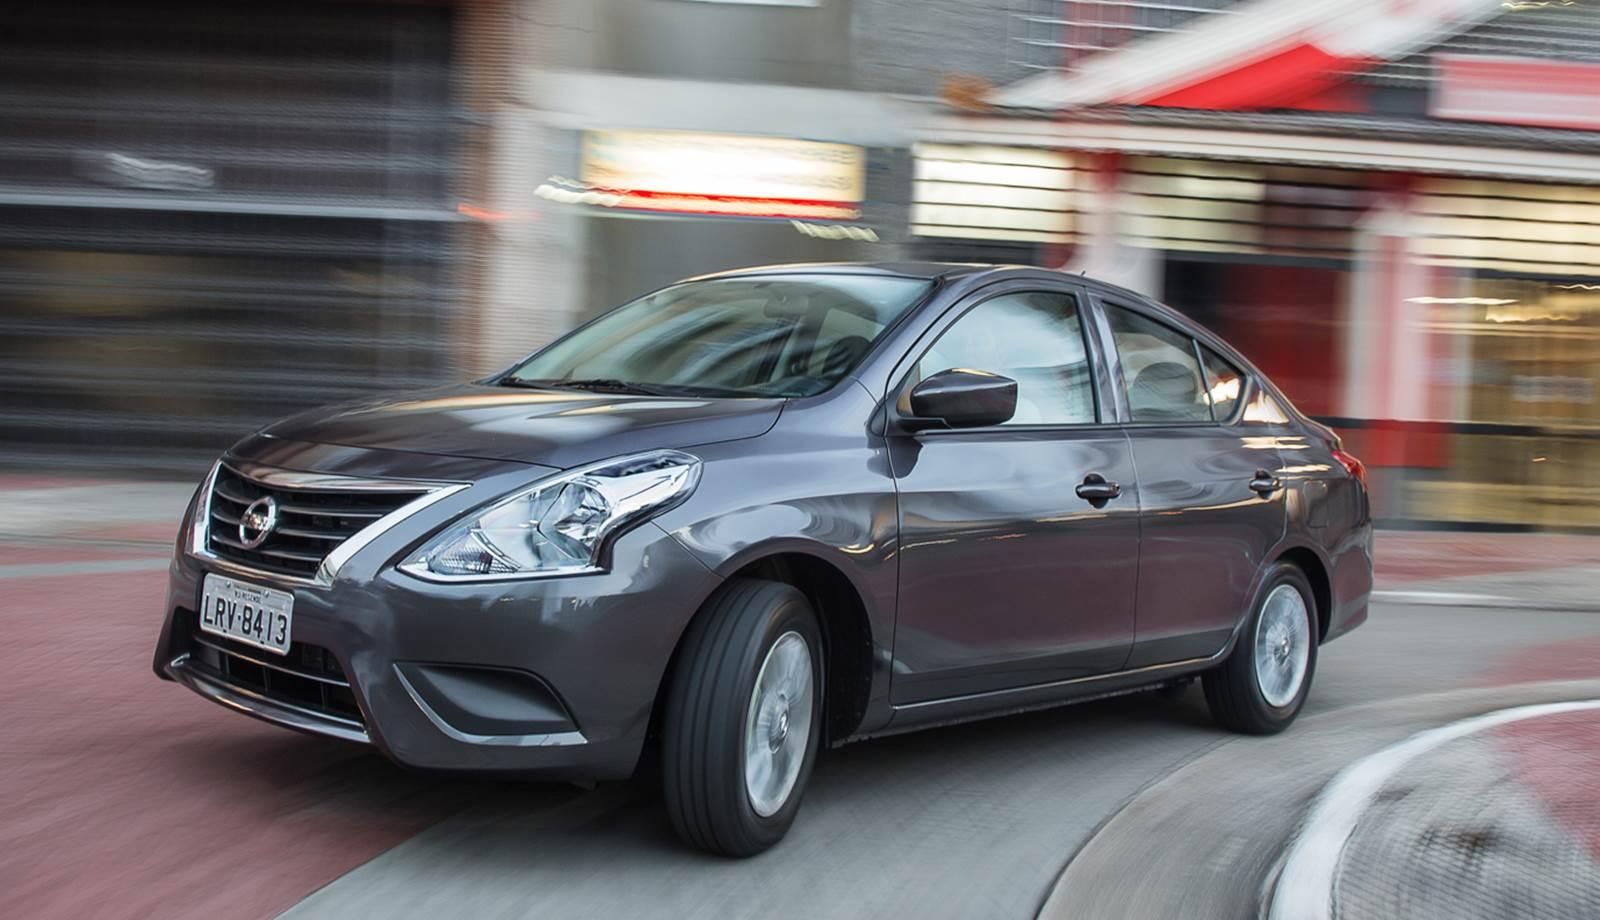 Novo Nissan Versa 2015